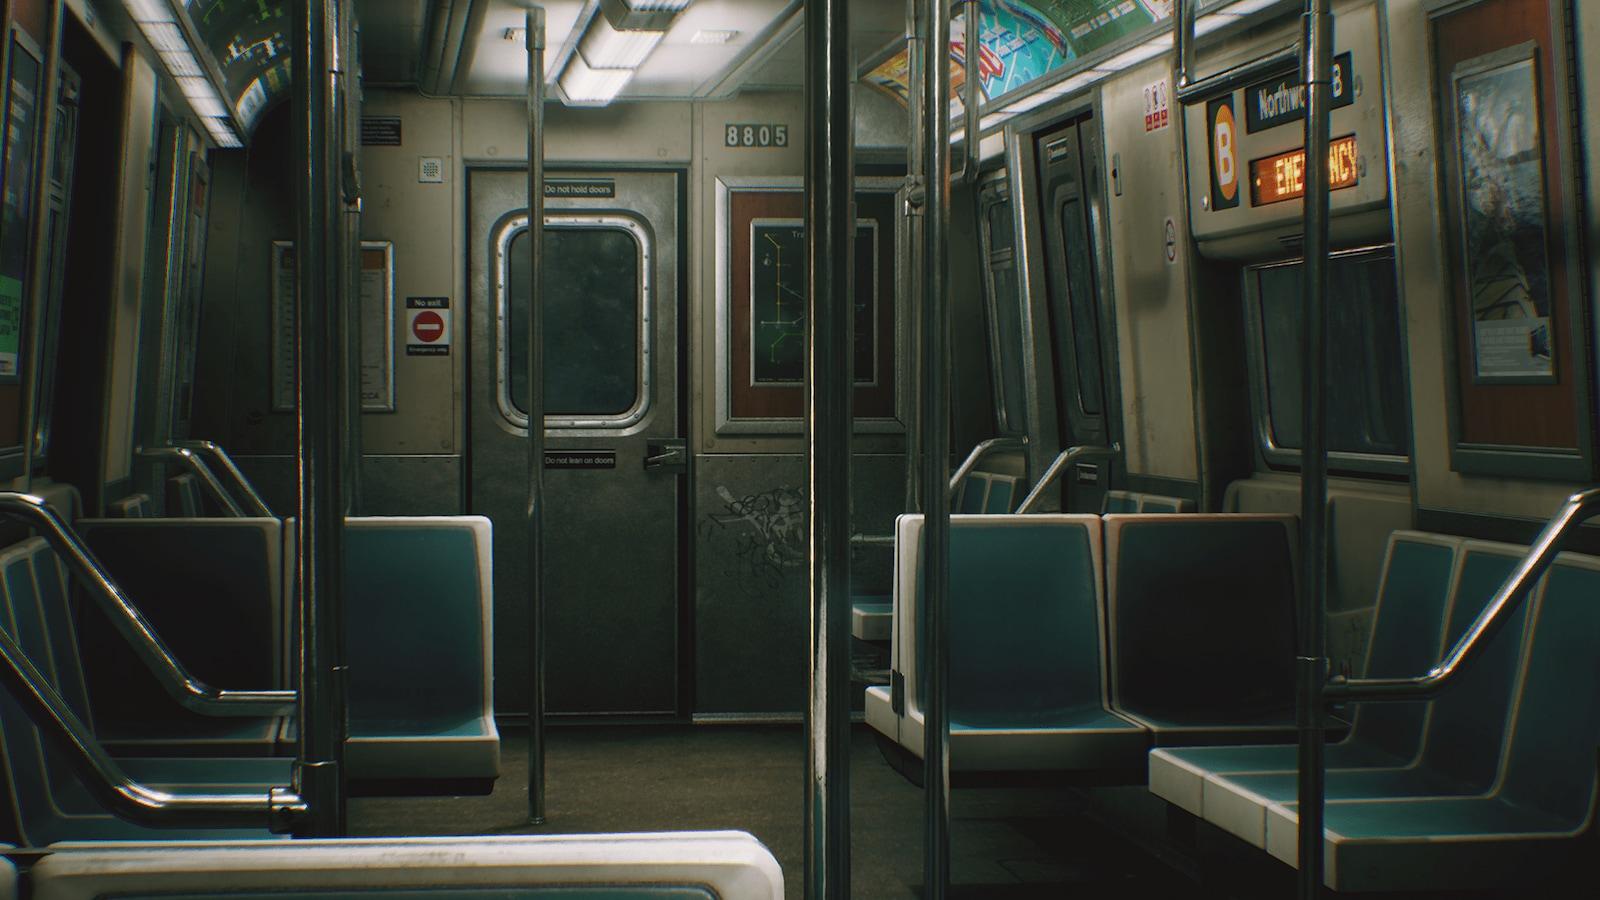 City Subway Train - Modular by Dekogon Studios in Environments - UE4  Marketplace